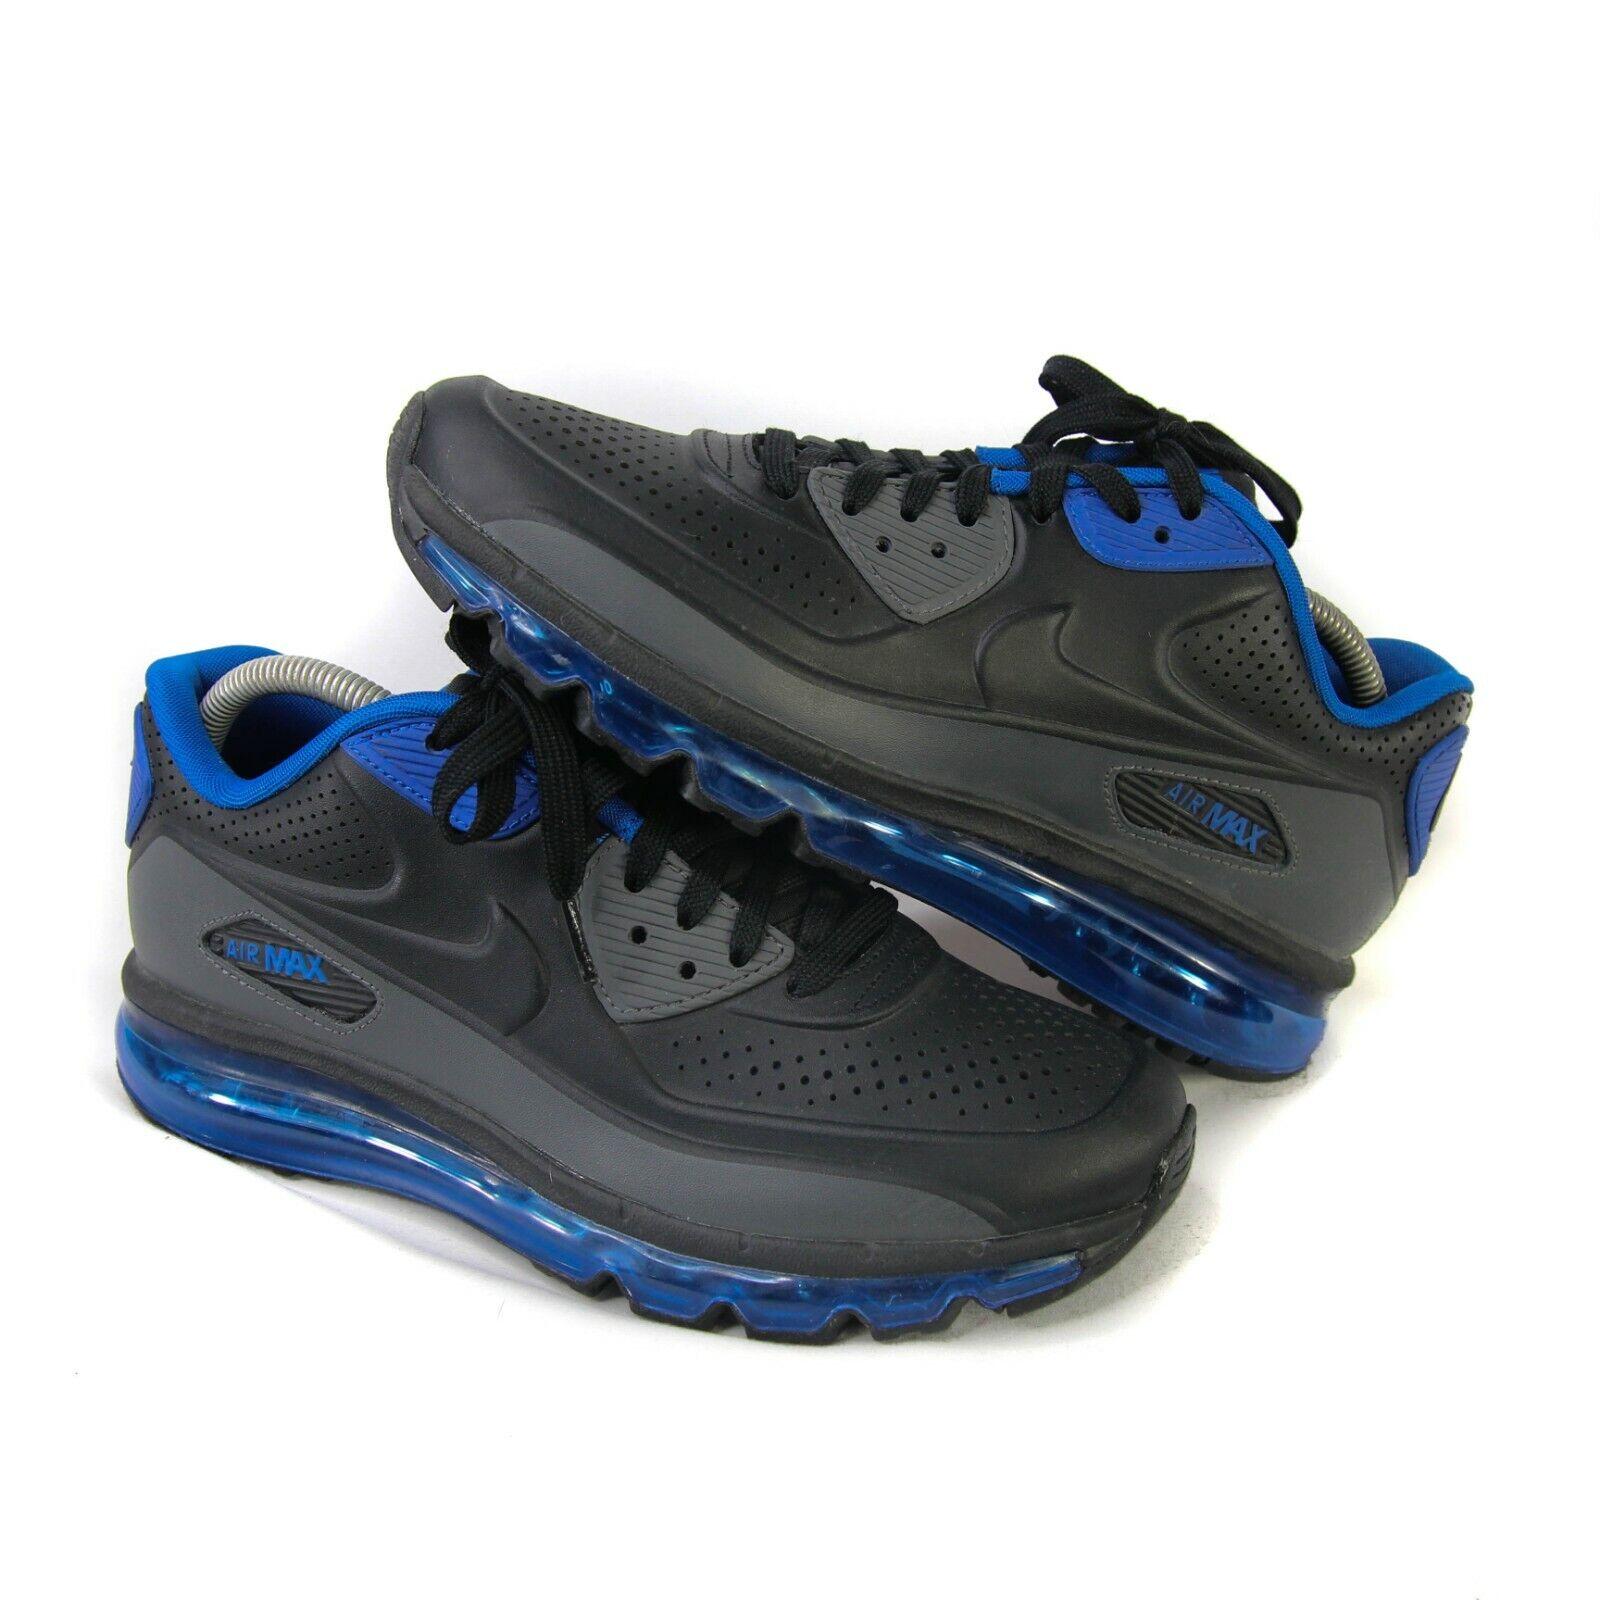 Nike Air Max 90s LTR GS Mens 8 Running shoes 2014 bluee Black